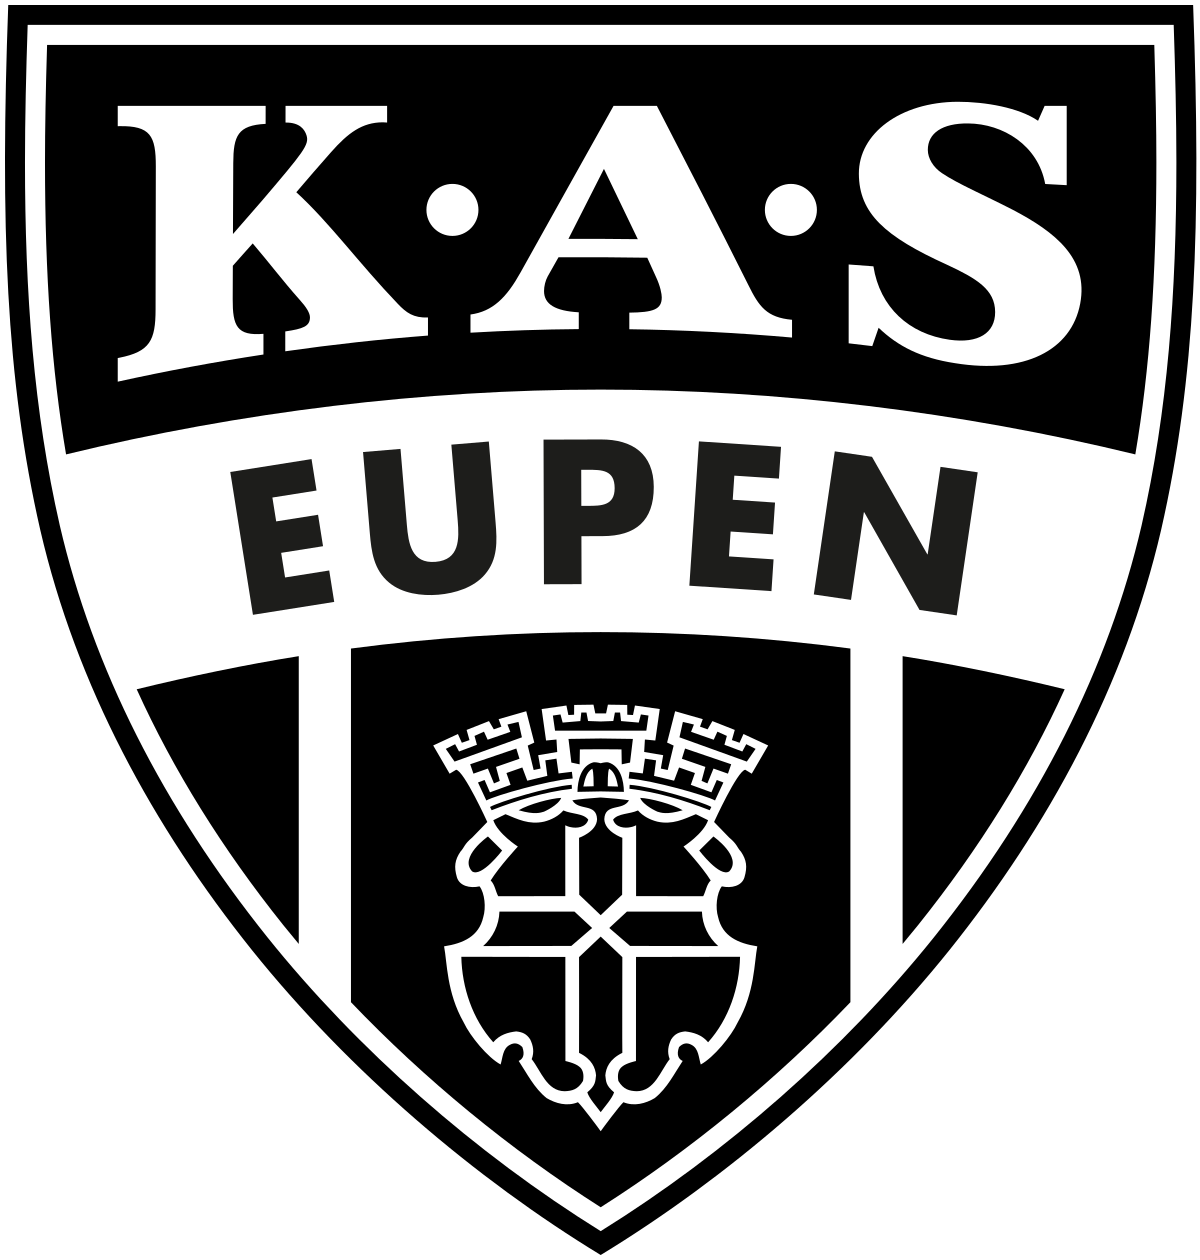 Eupen Tickets